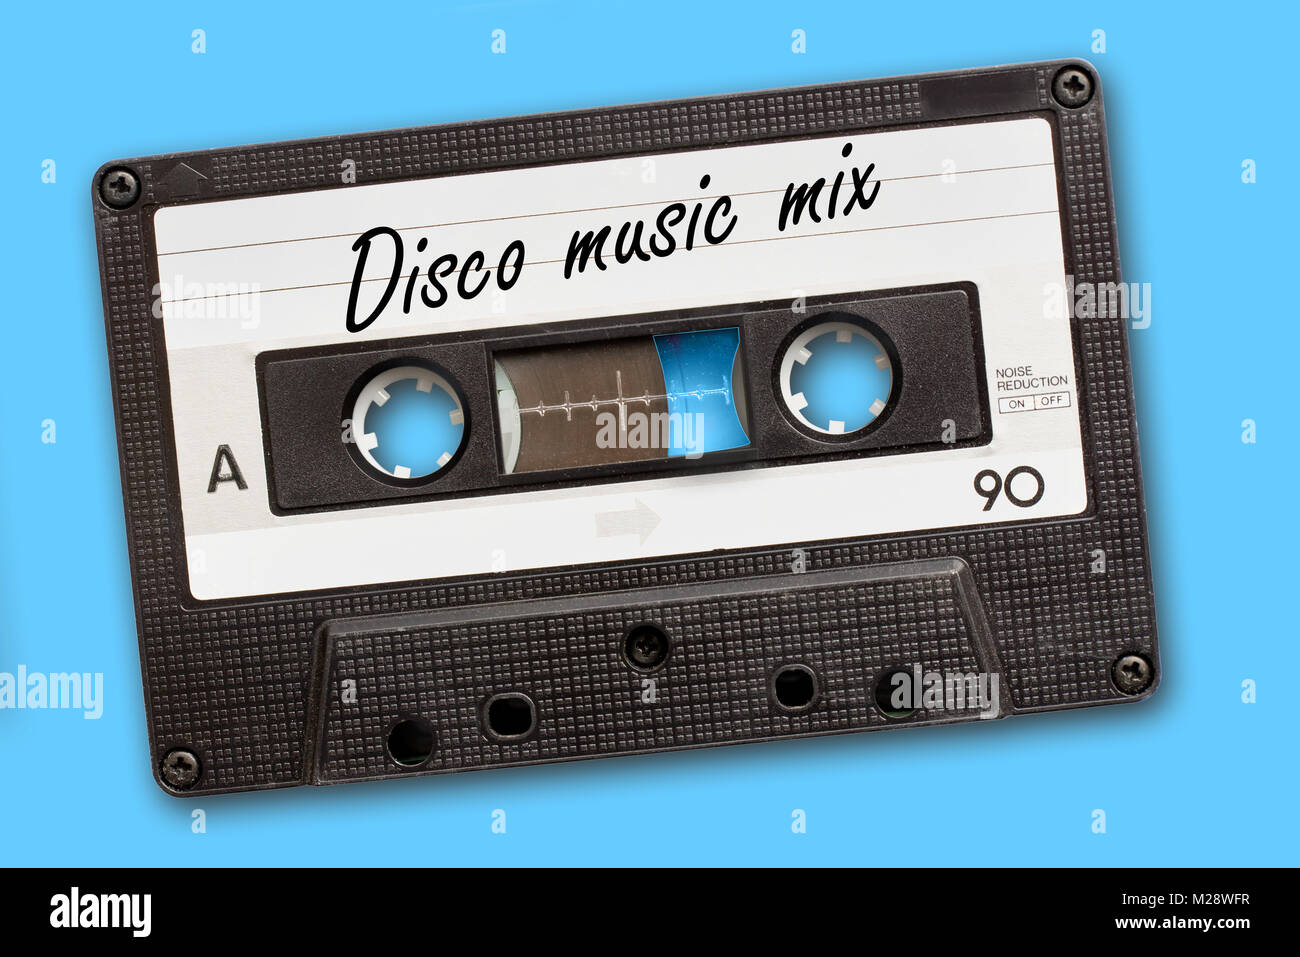 Disco music mix written on vintage audio cassette tape, blue background - Stock Image